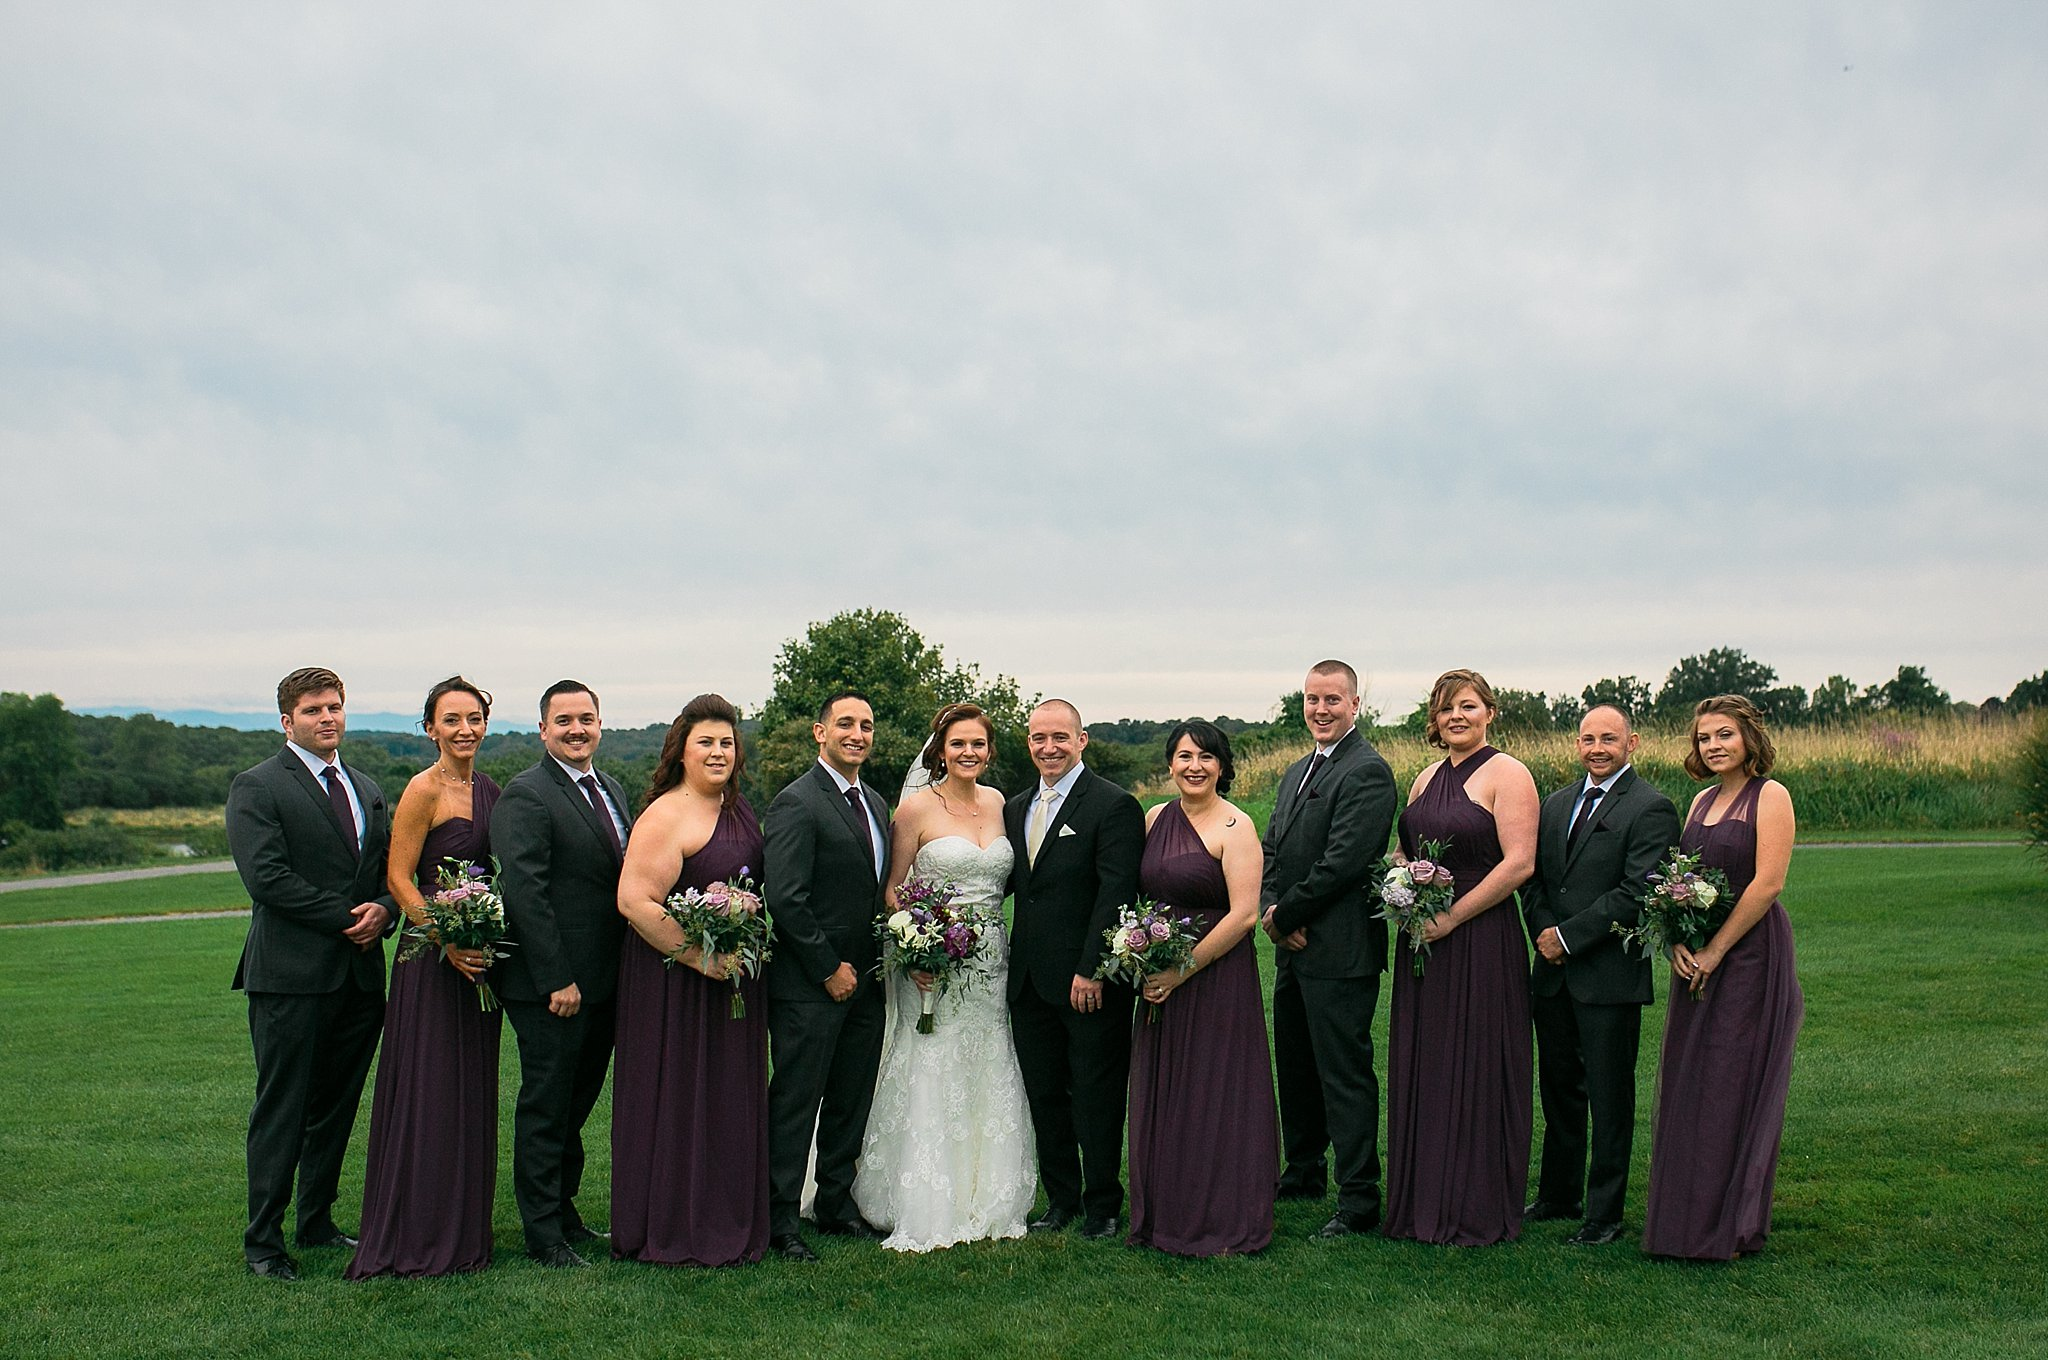 Links at Unionvale Wedding Lagrangeville Wedding Hudson Valley Wedding Photographer Sweet Alice Photography42.jpg